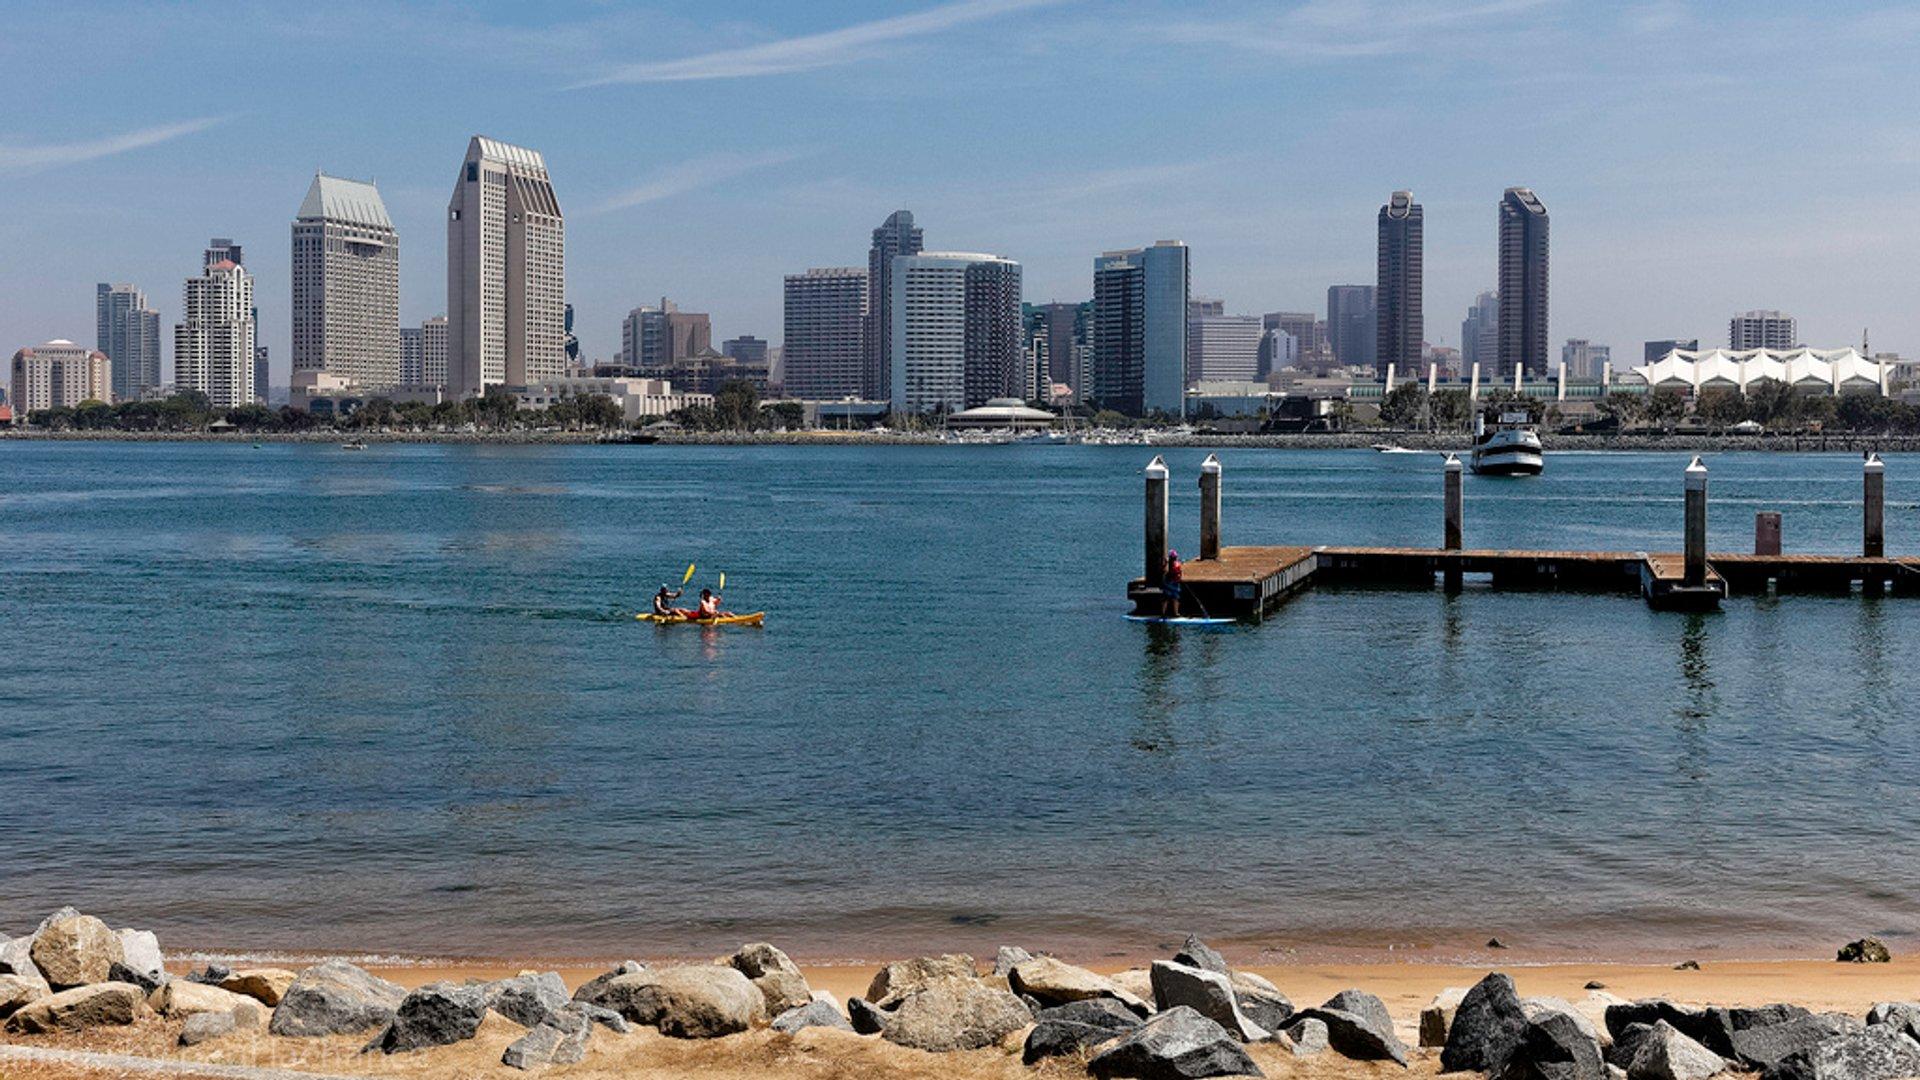 Kayaking in San Diego 2020 - Best Time